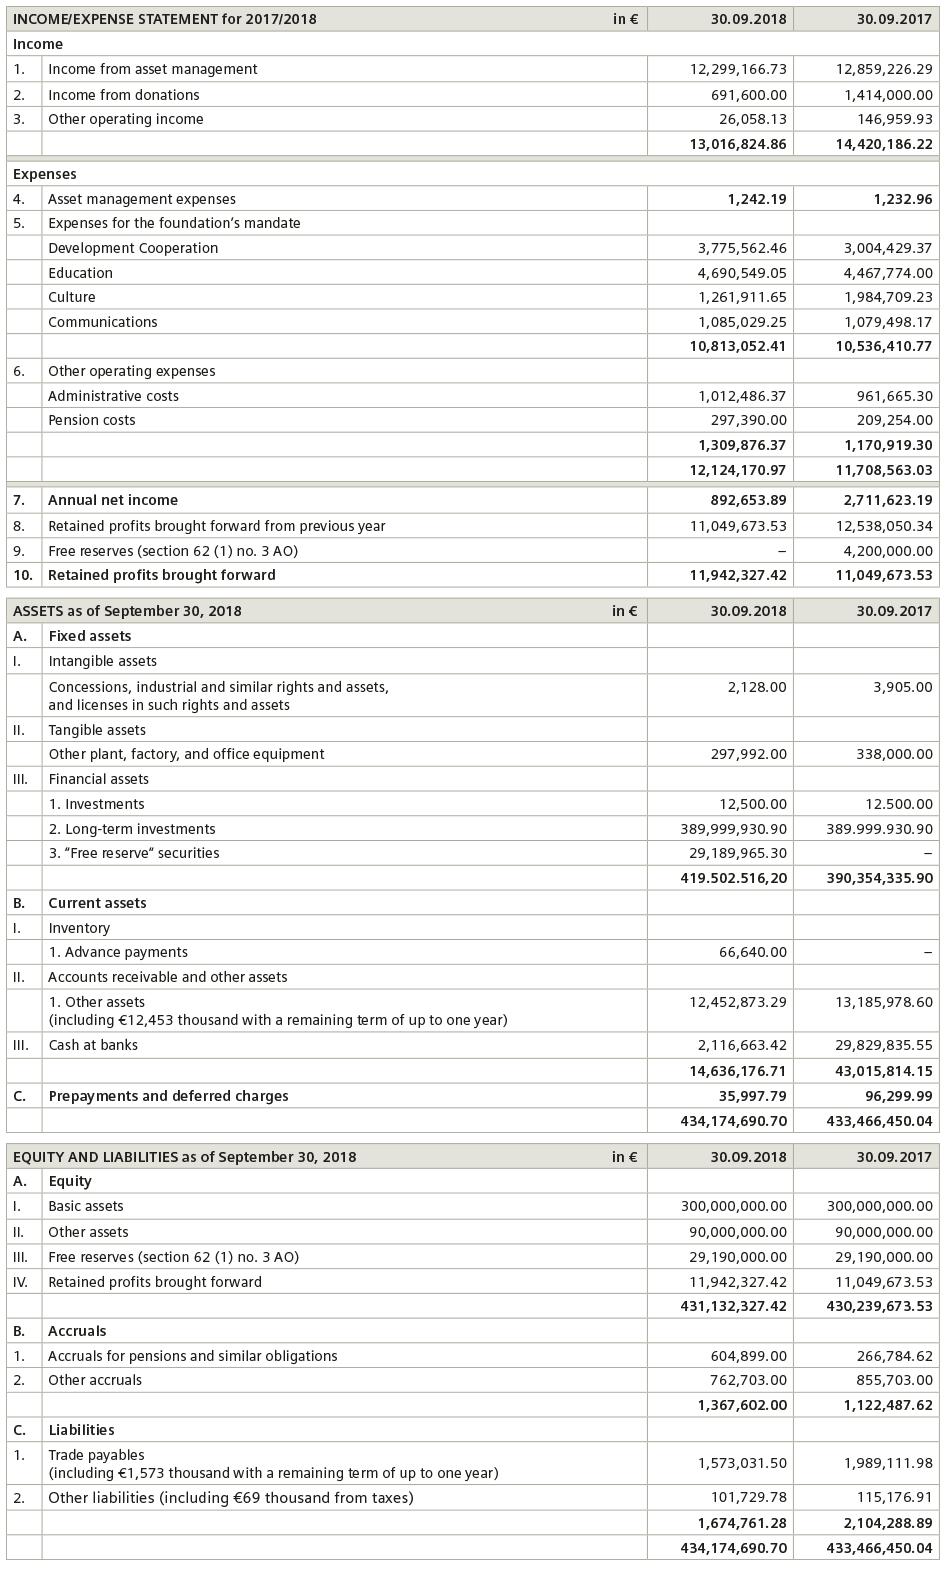 stiftung-finanzbericht-ganzes-bild-2017-2018-englisch